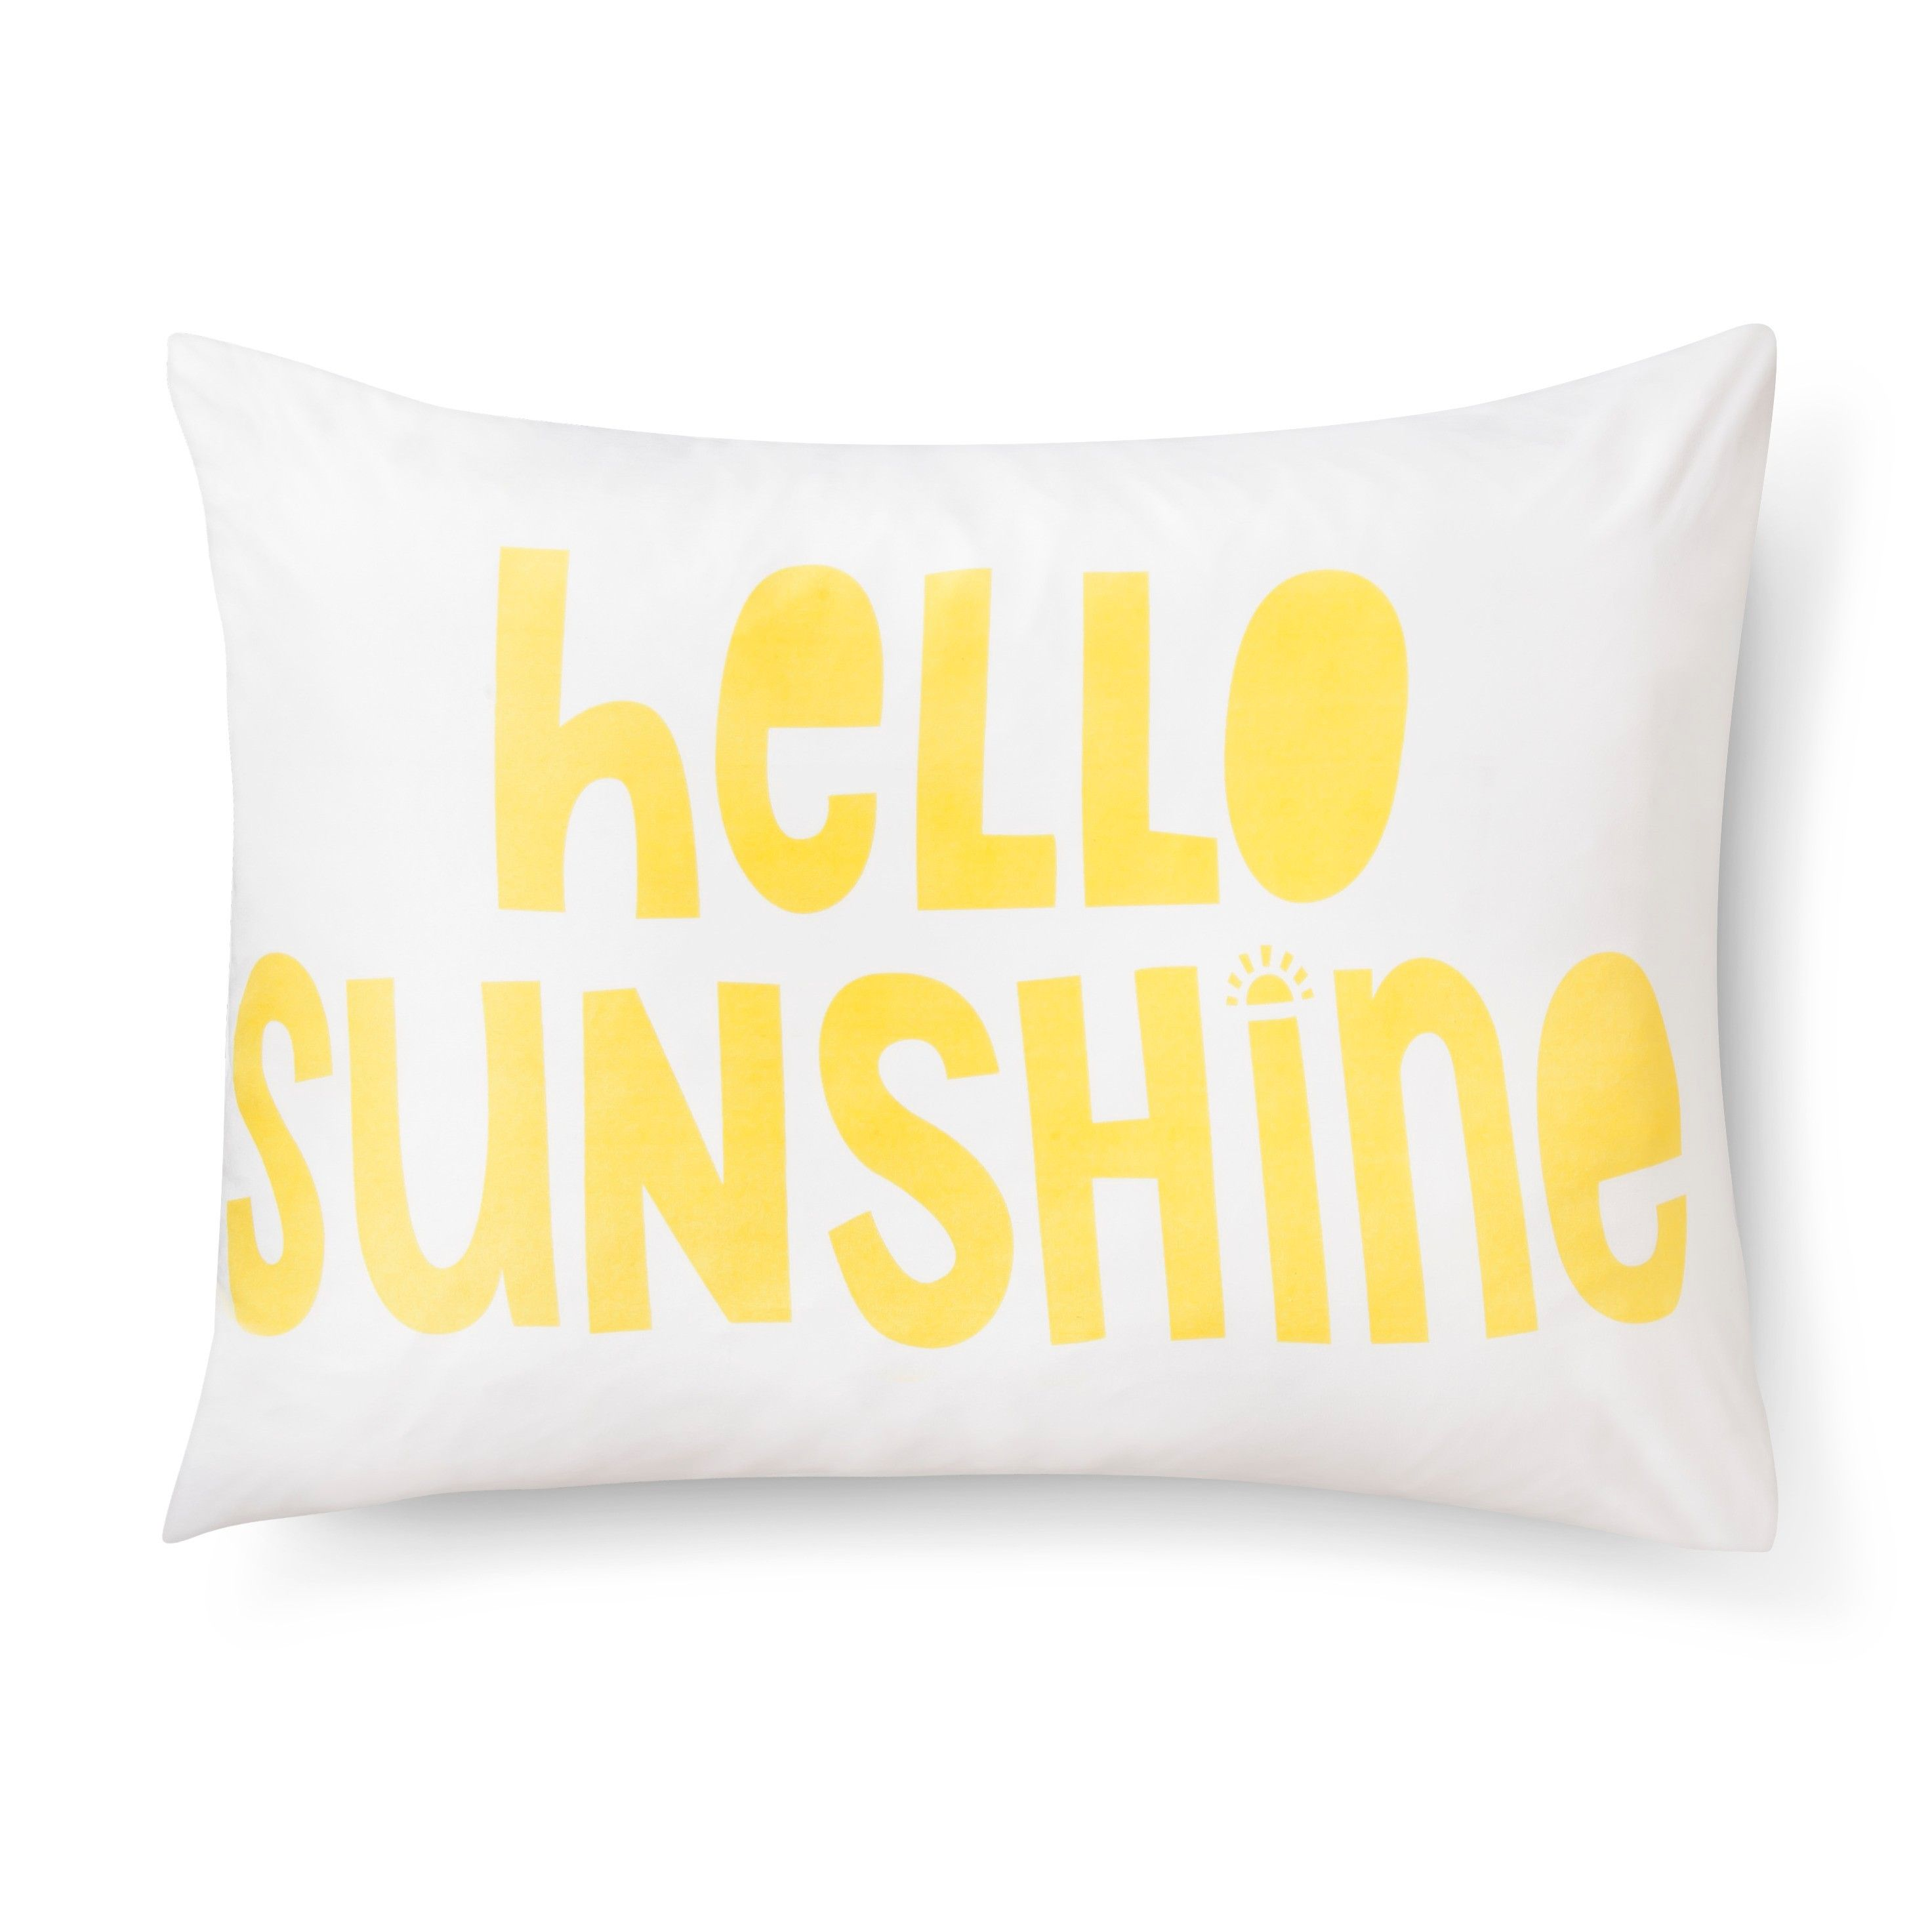 HELLO SUNSHINE Pillow | Word pillow